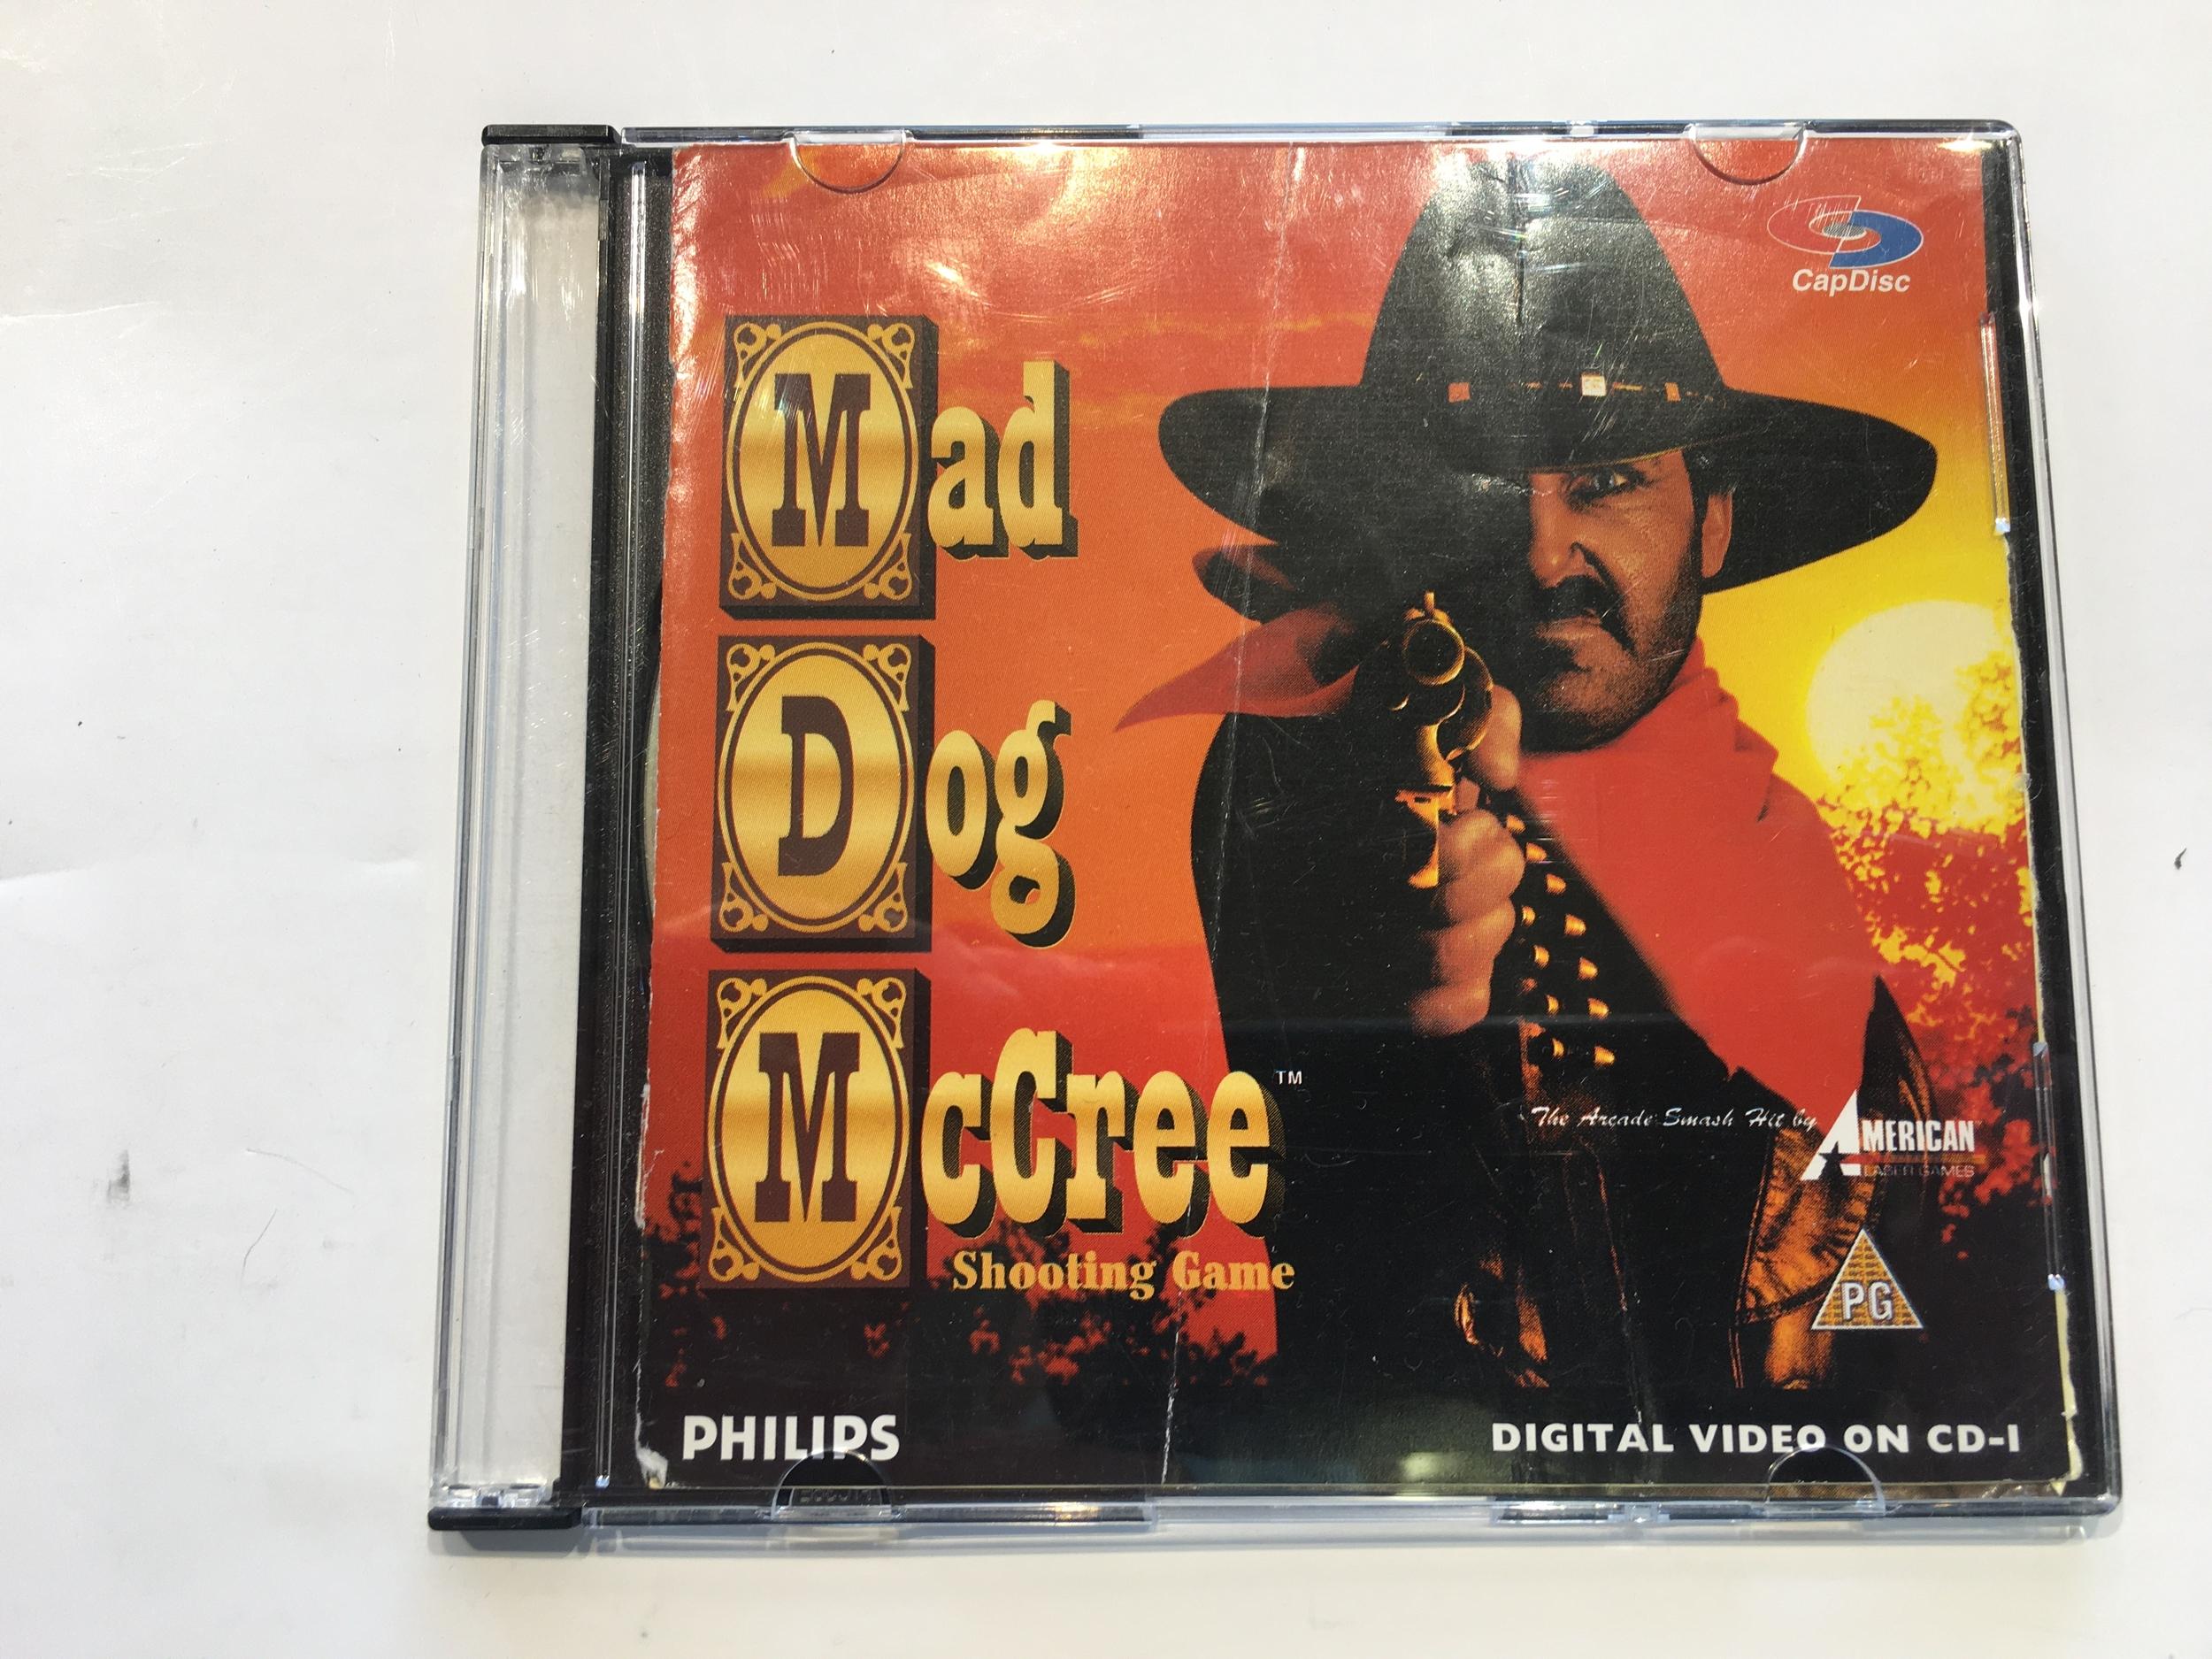 Mad Dog McCree - Philips CD-i